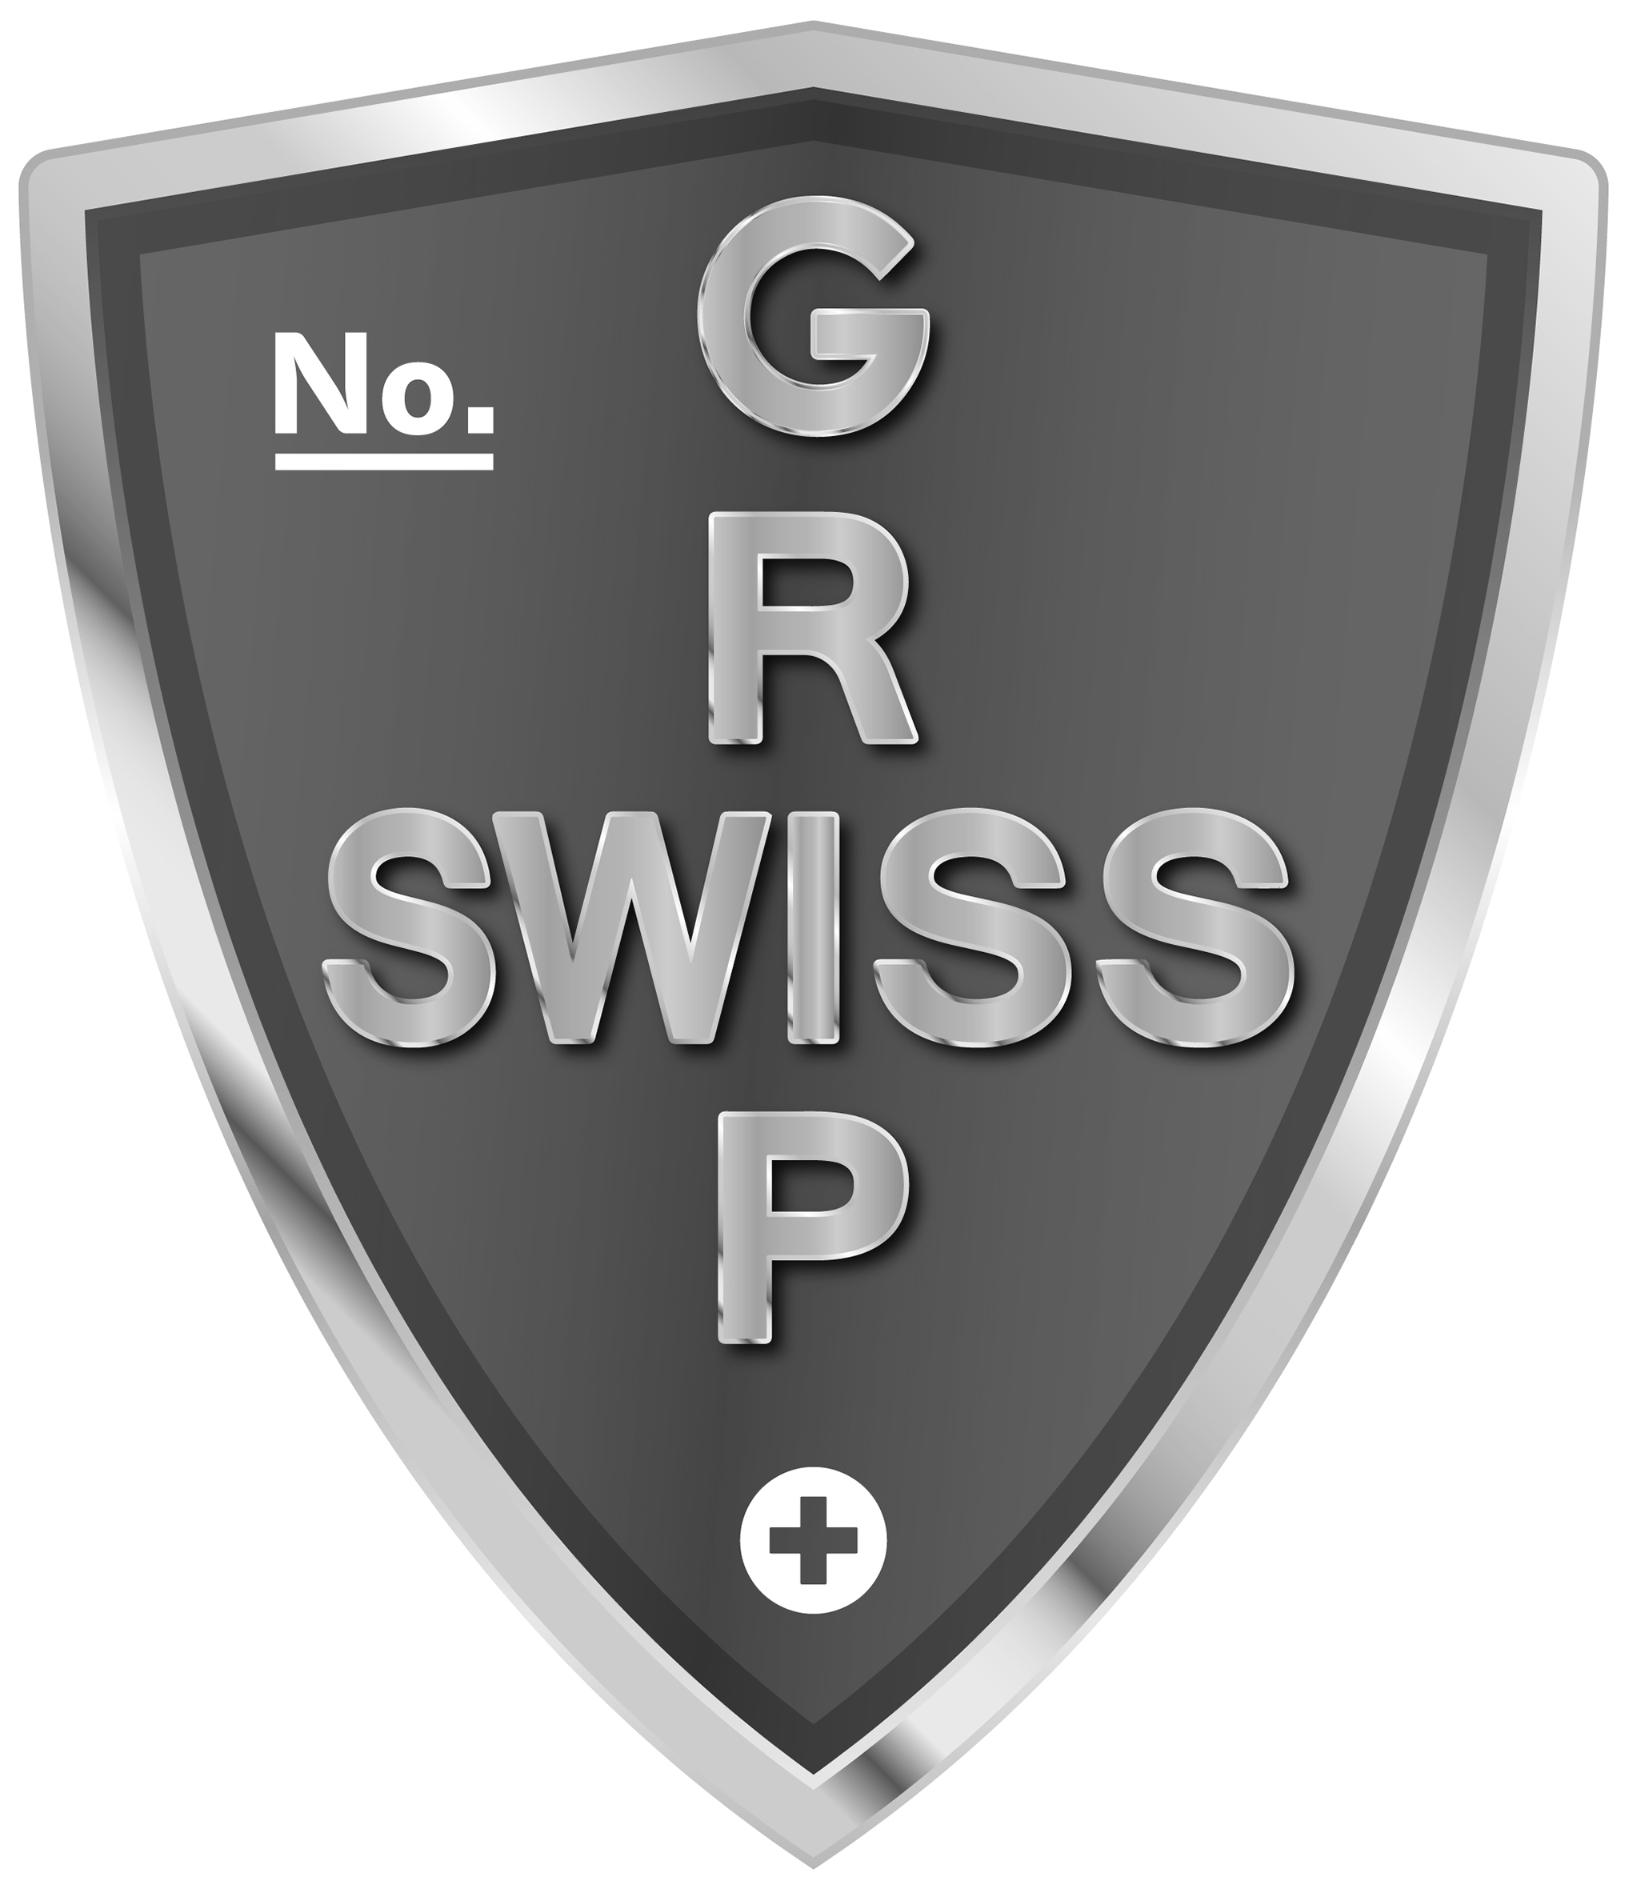 GRIP SWISS No. (fig.))